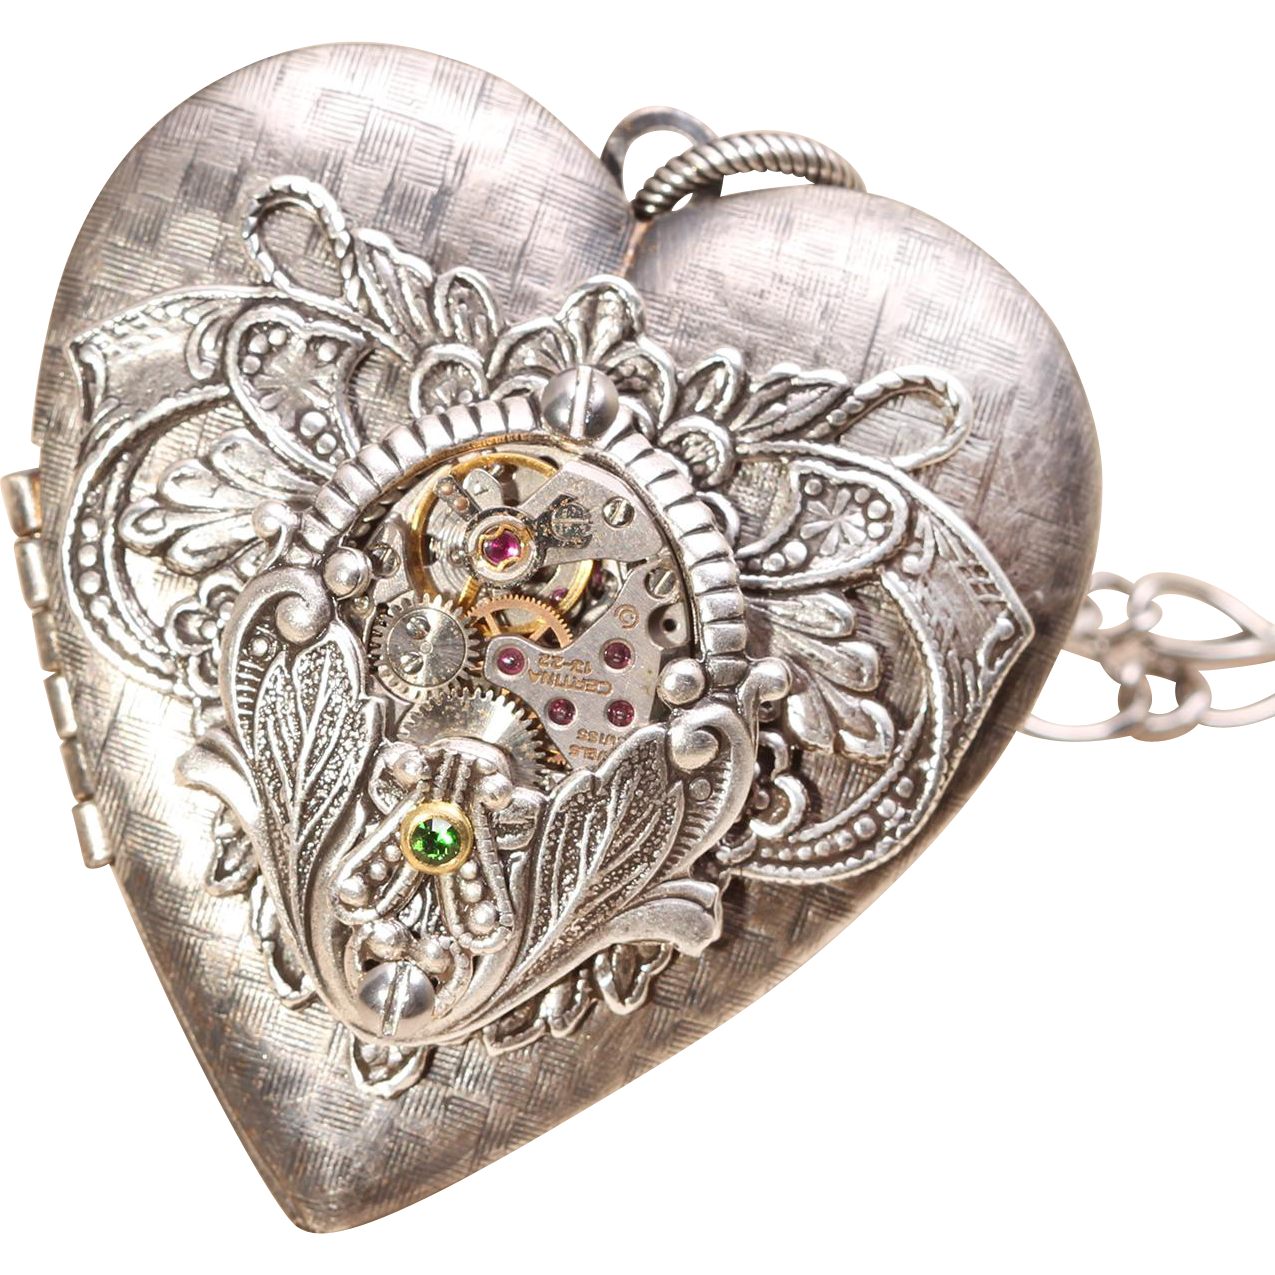 Steampunk Heart Necklace Steampunk Heart Locket Necklace Steampunk Picture Locket Necklace